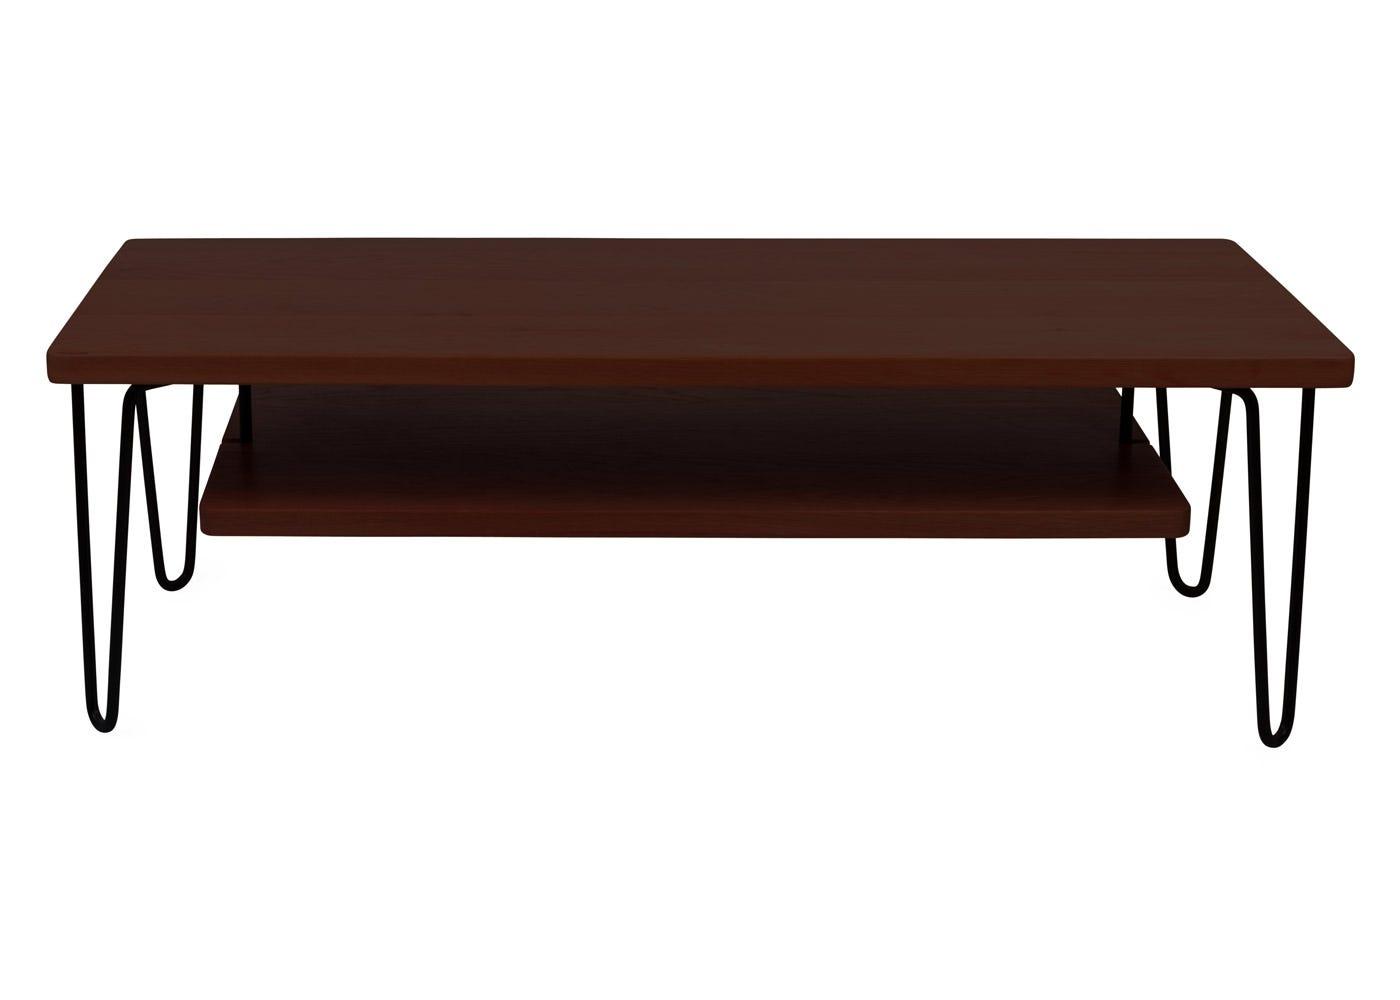 As shown: Brunel Coffee Table / AV Unit Dark Wood.